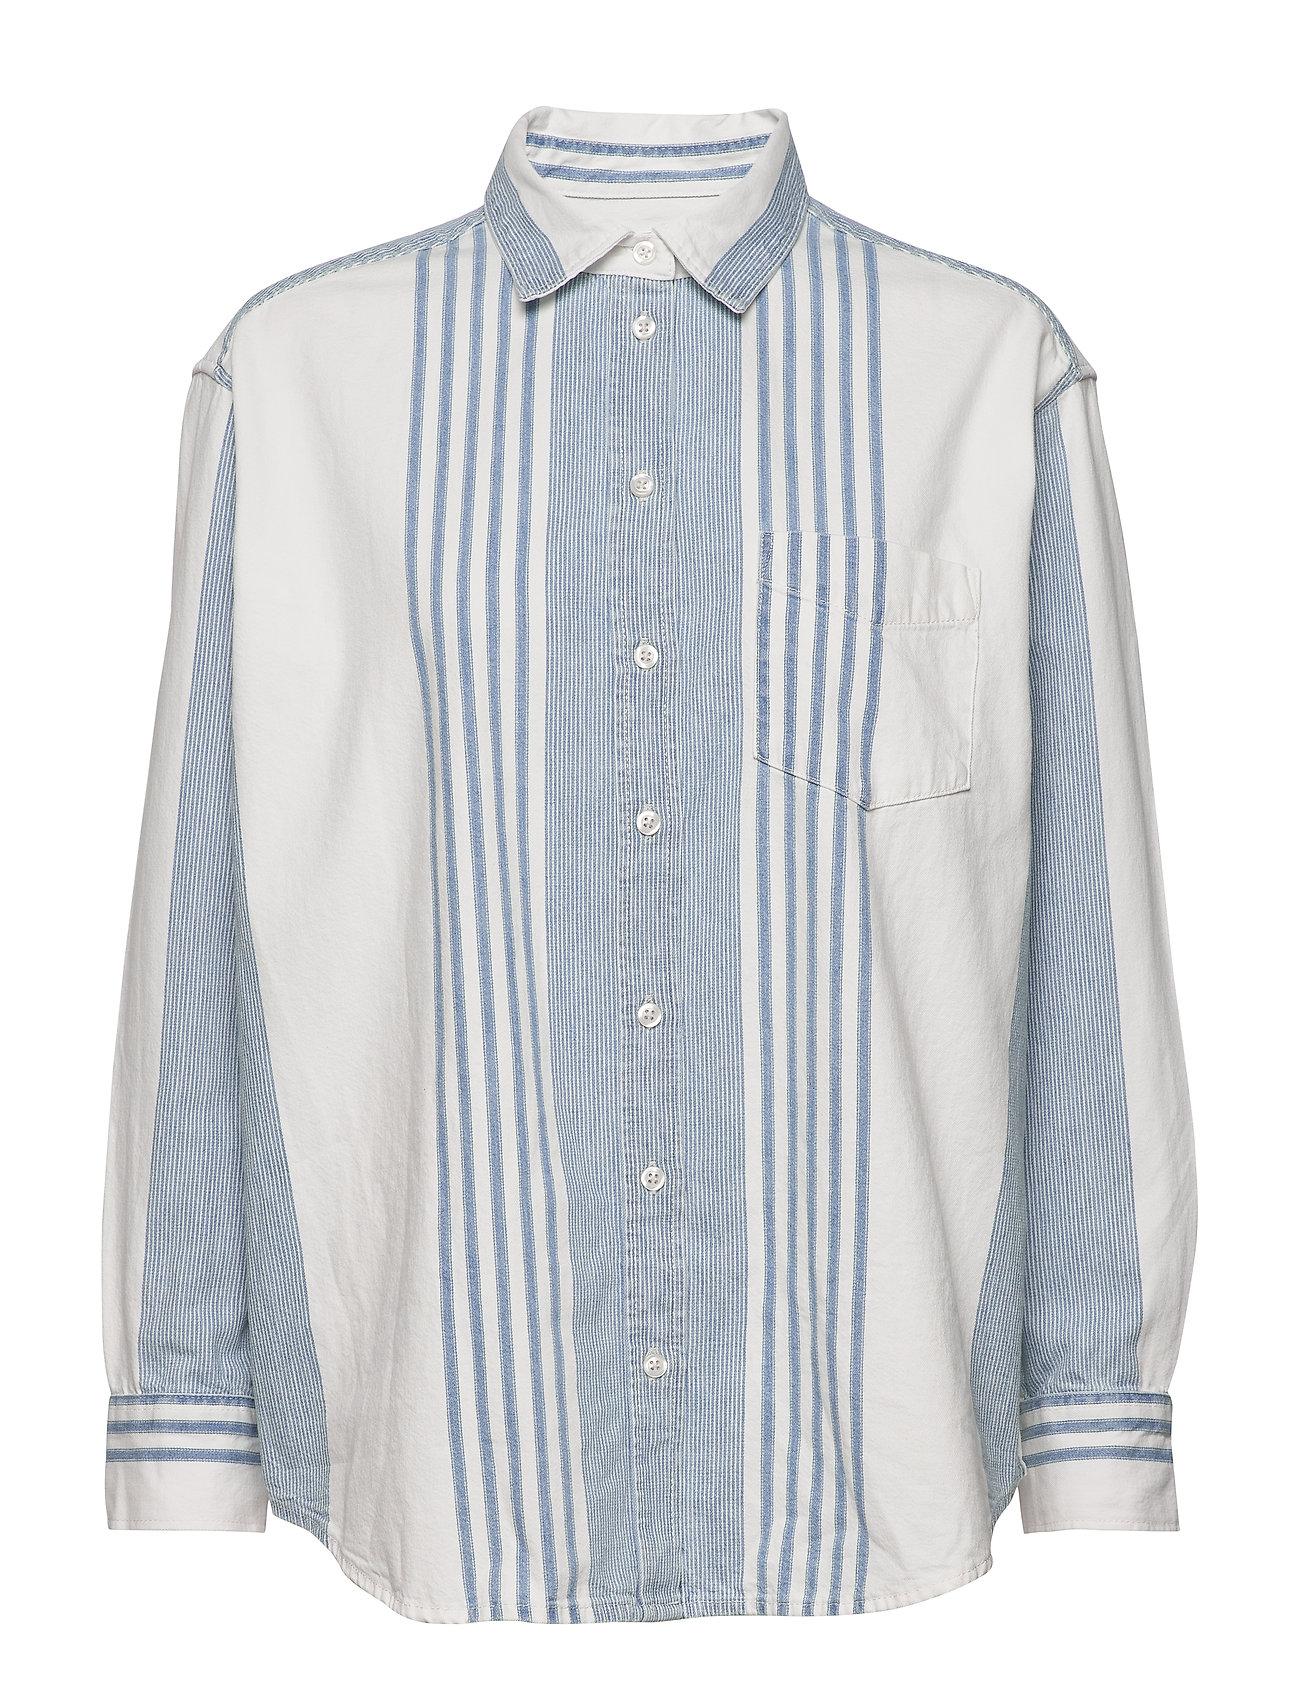 Image of The Big Shirt Langærmet Skjorte Blå GAP (3406259403)